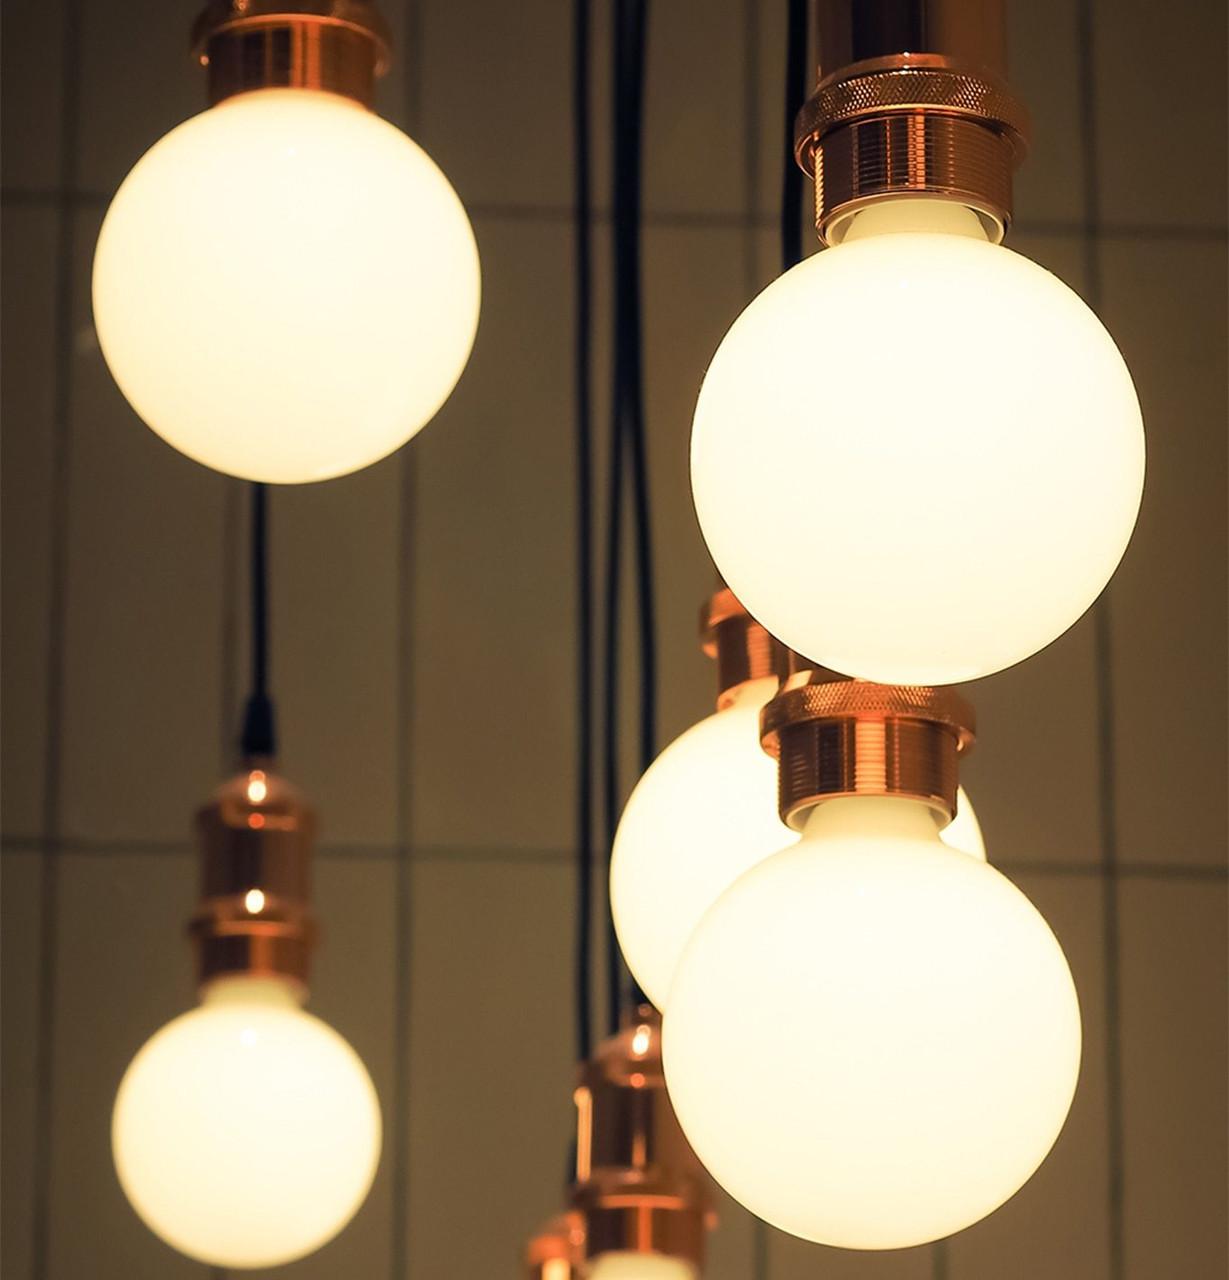 LED Dimmable G125 Screw Light Bulbs